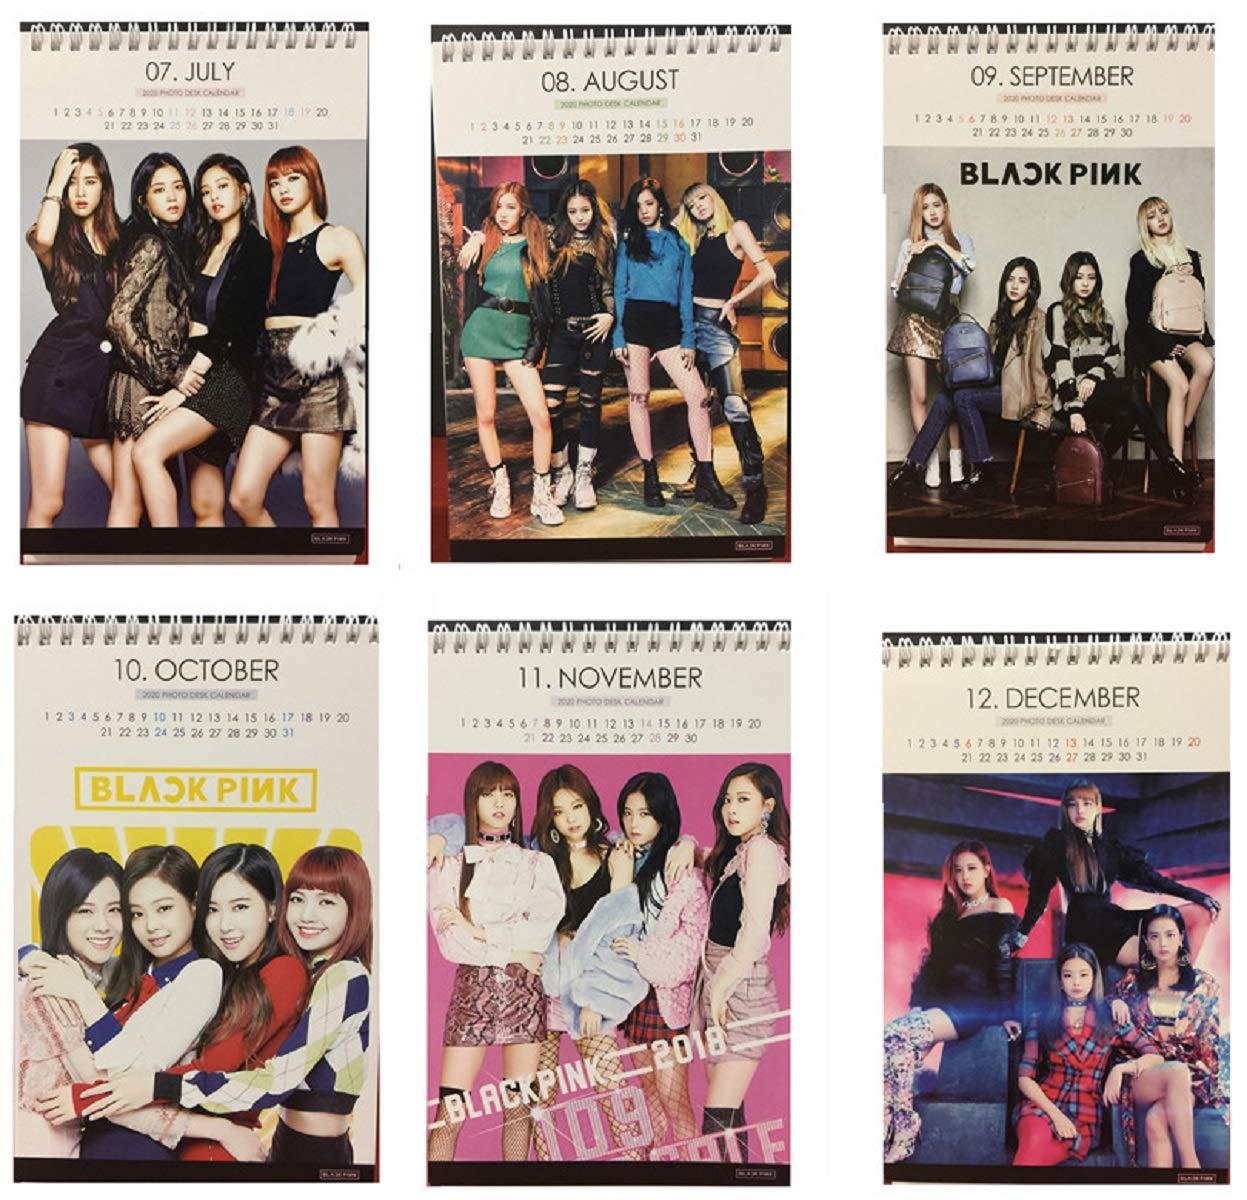 cac97f855b5d Amazon.com   Kpop Blackpink 2019   2020 Photo Desk Calendar with Photo Card  (3pcs)   Office Products